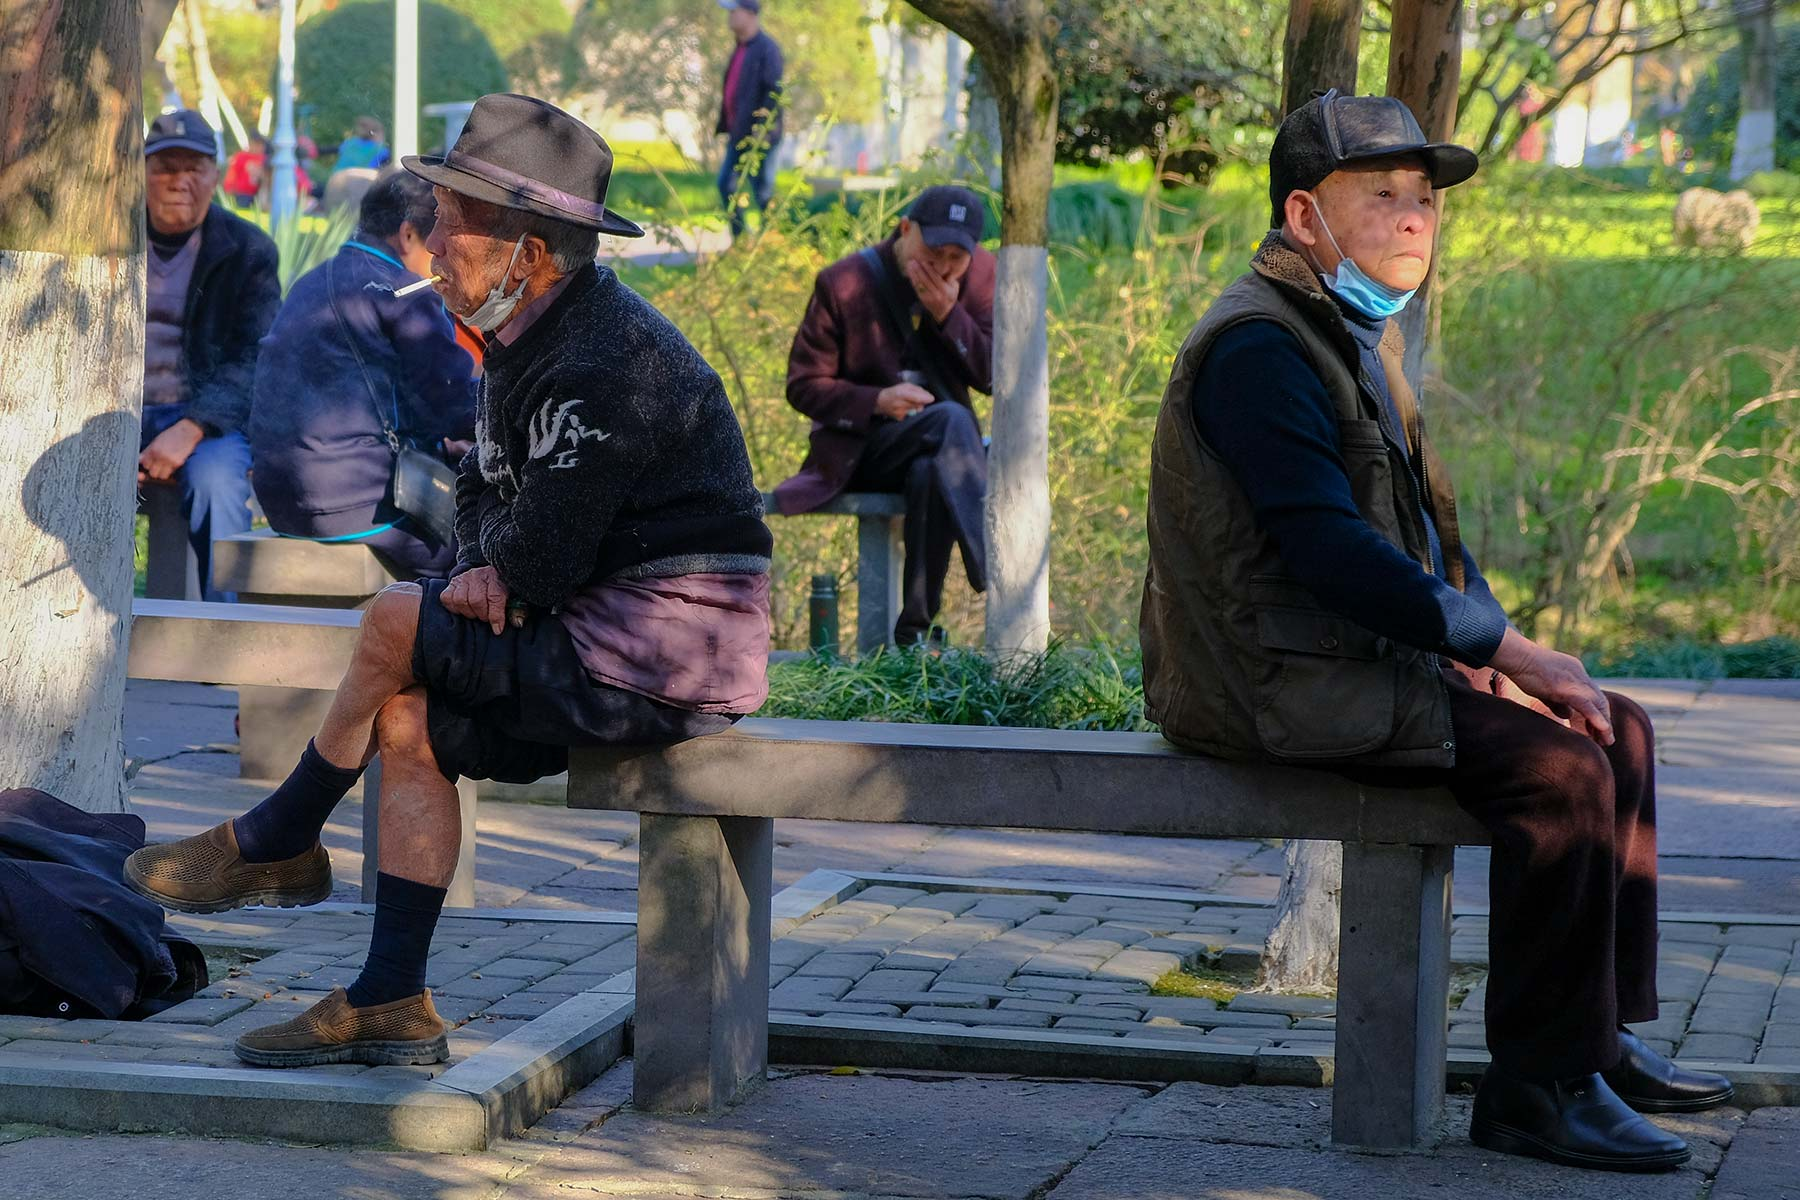 Alte Männer sitzen im Zhongshan Park in Ningbo, China